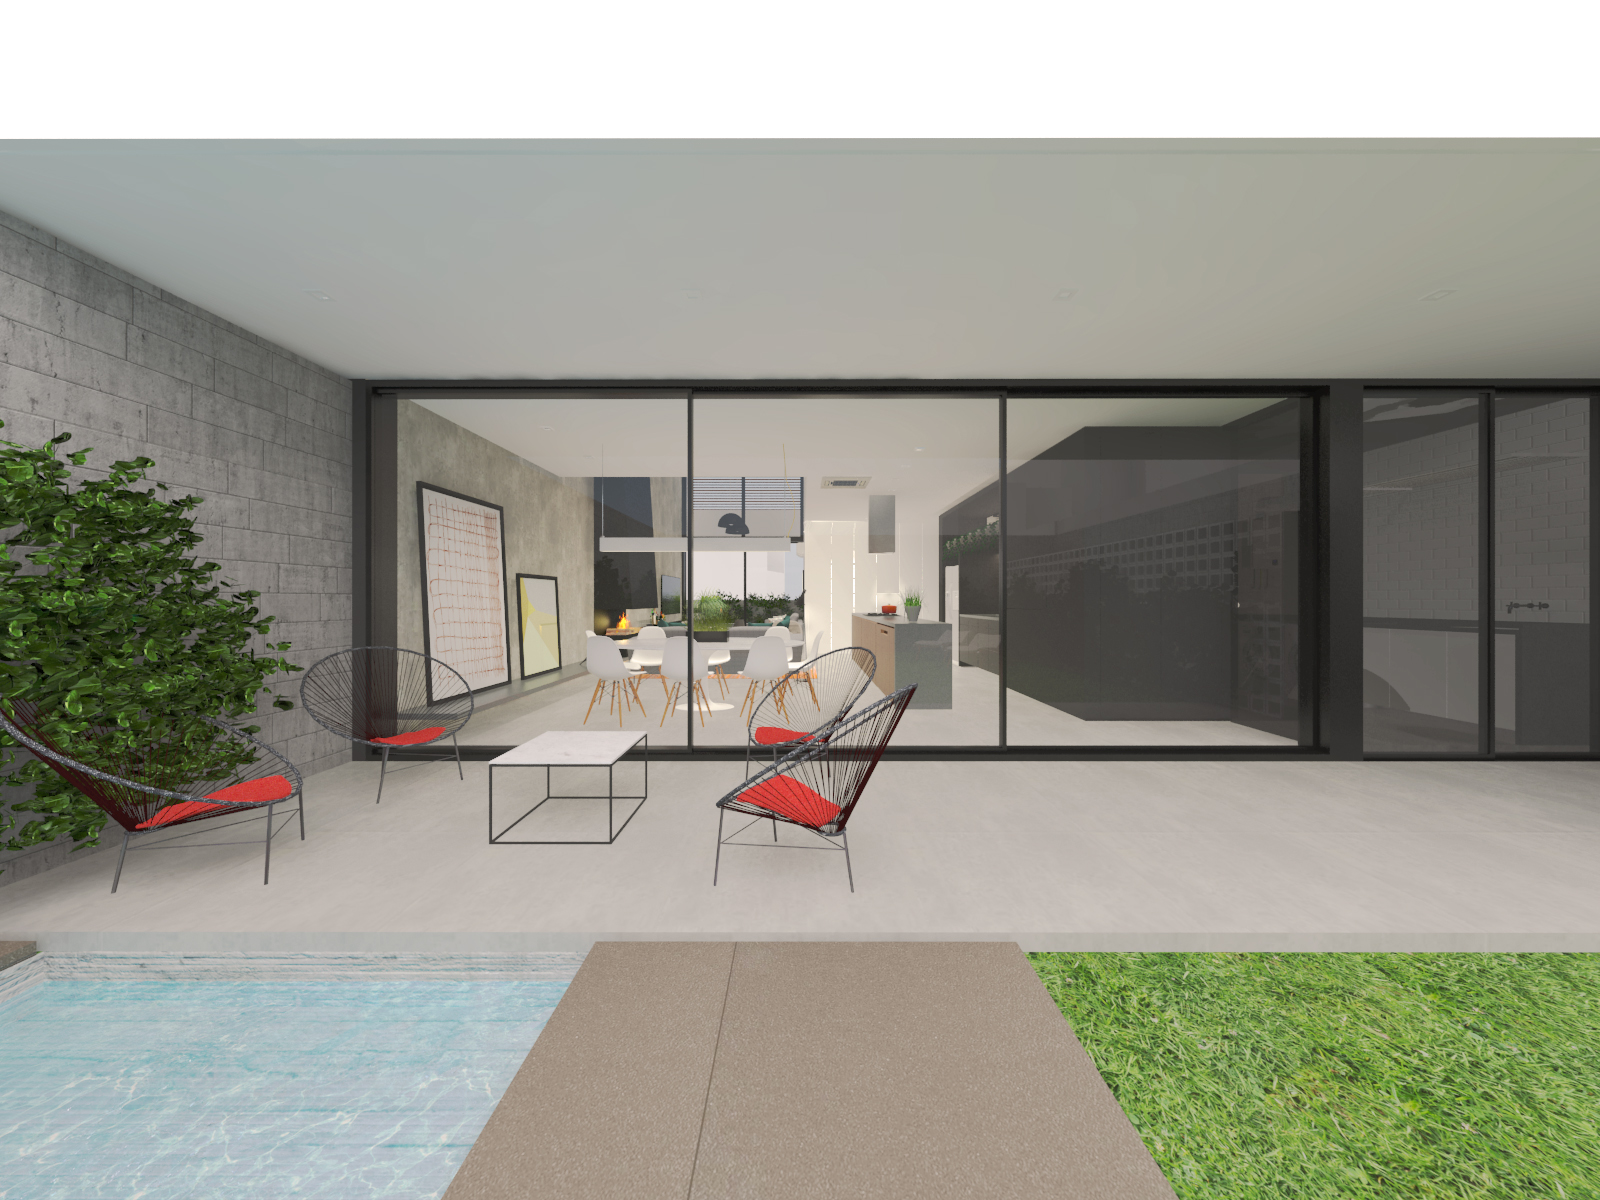 casa chassot | fachada posterior